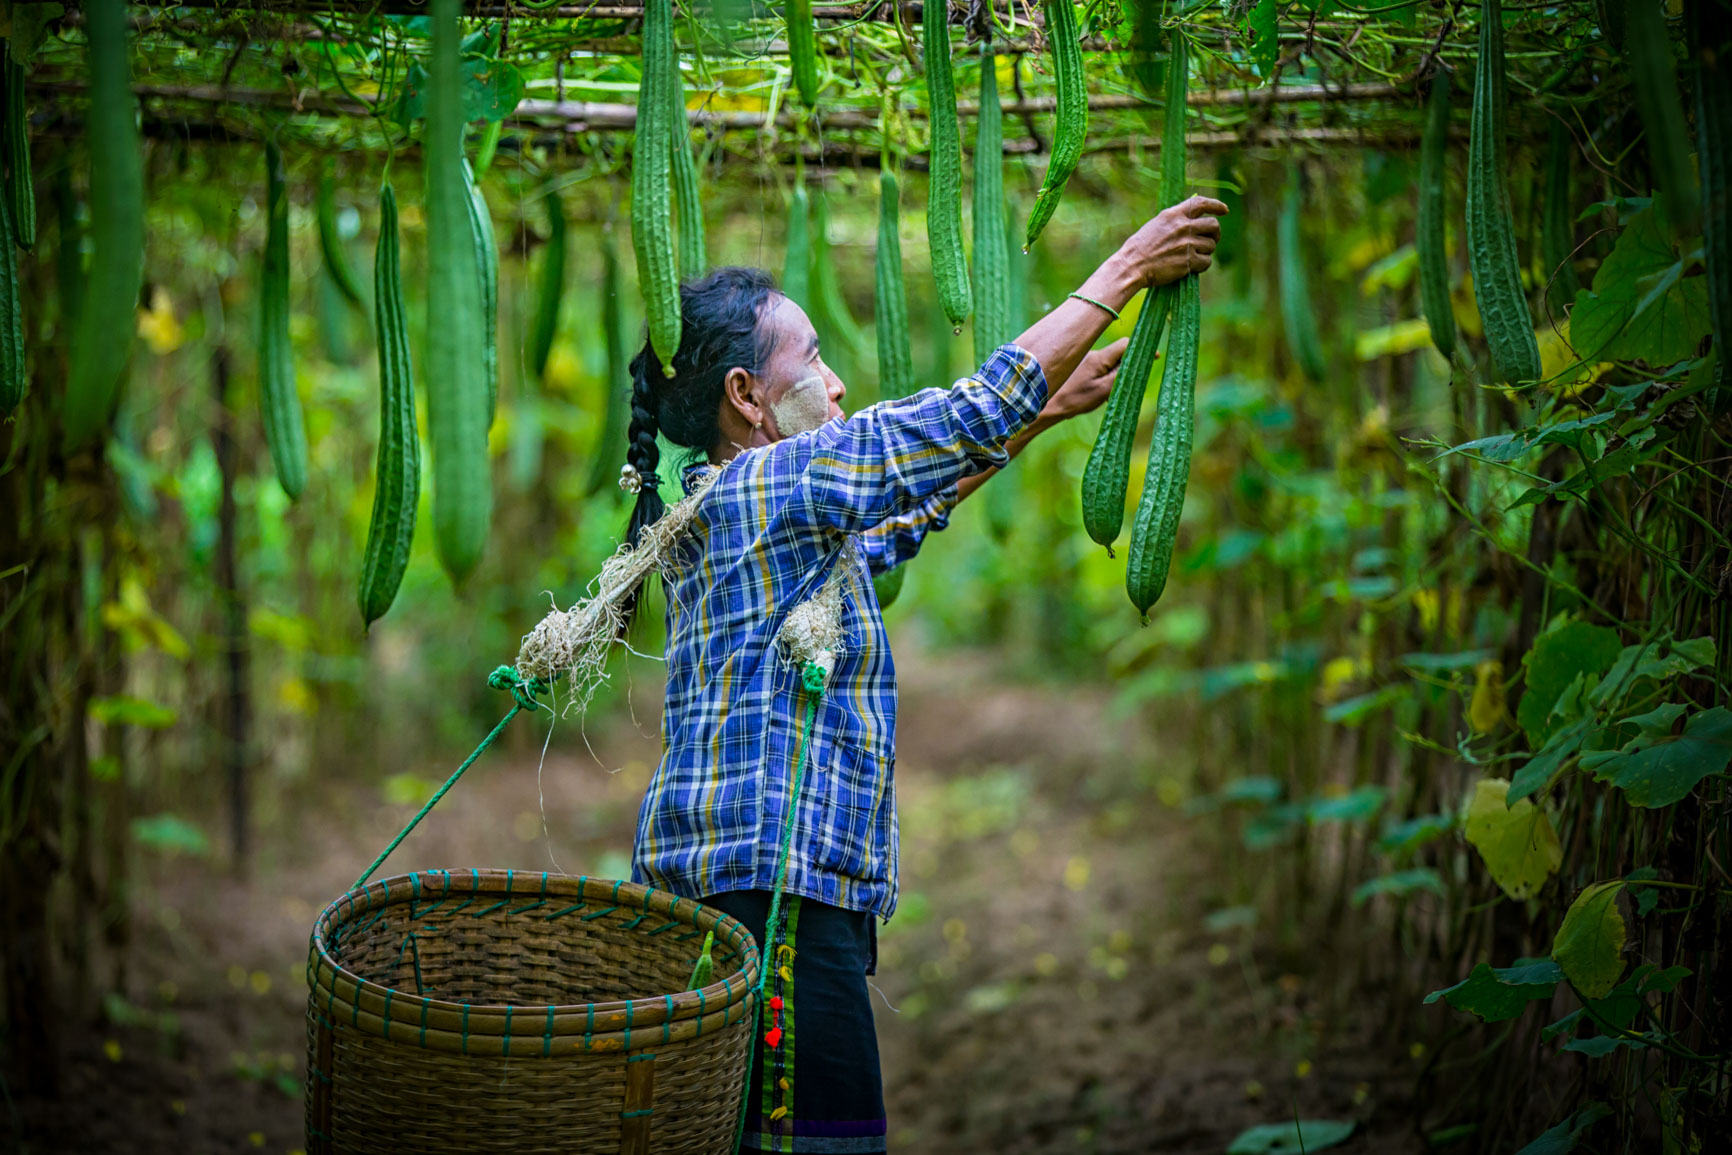 A Conversation on Sustainability – Through Photos